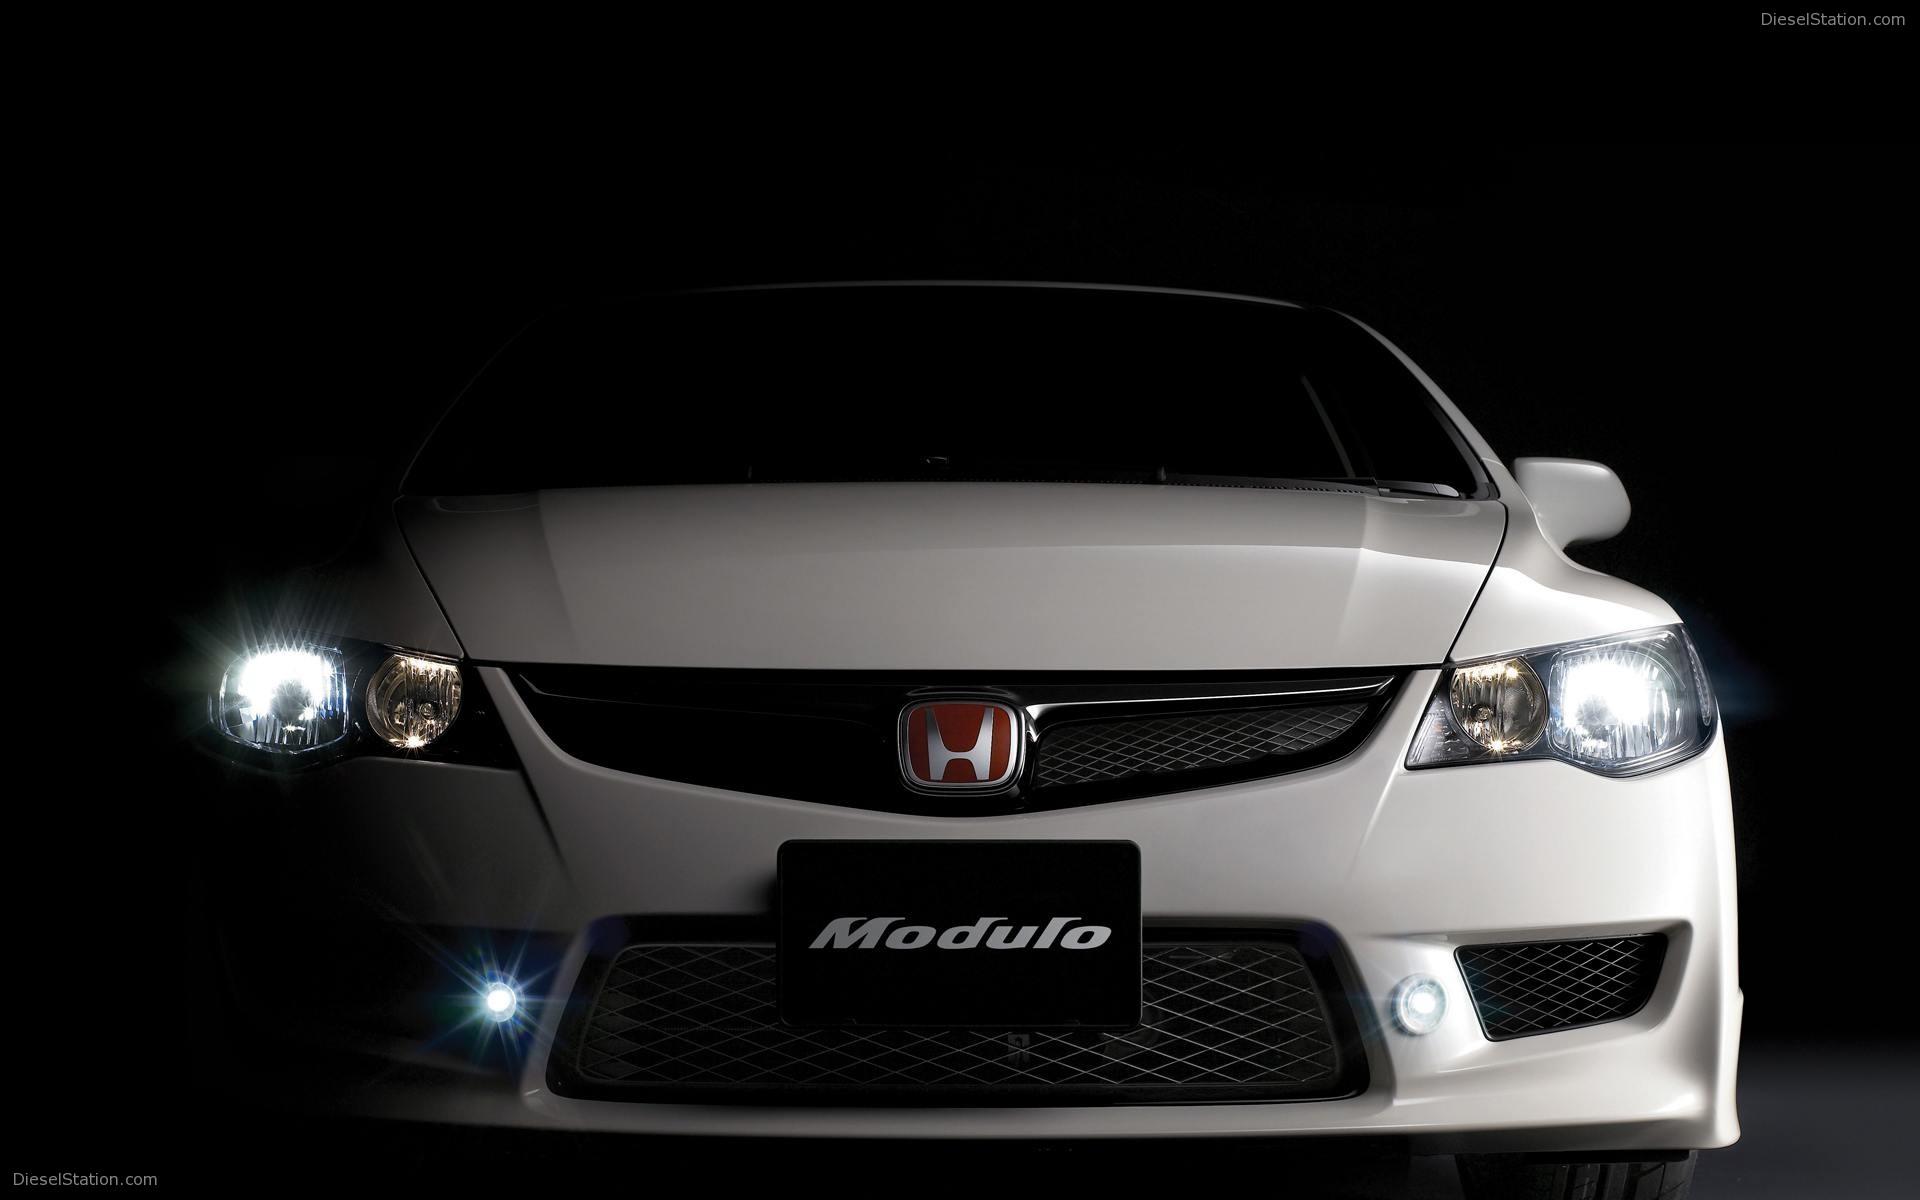 Honda Civic Type R Wallpapers Widescreen Exotic Car 1920x1200